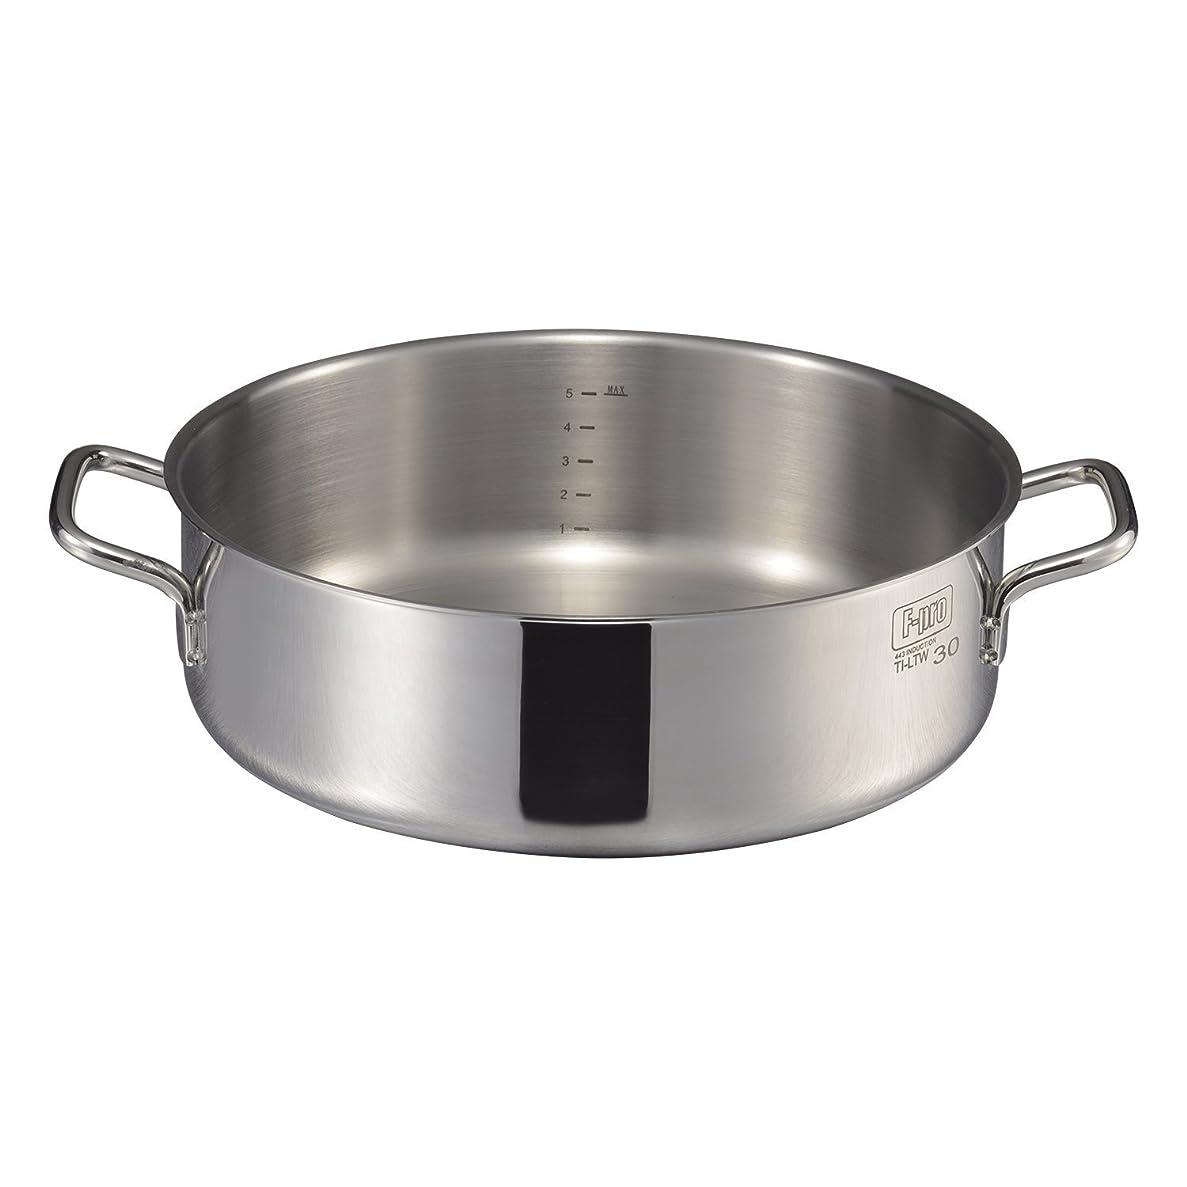 MTI IH F-PRO 外輪鍋 蓋無 (目盛付) 36cm